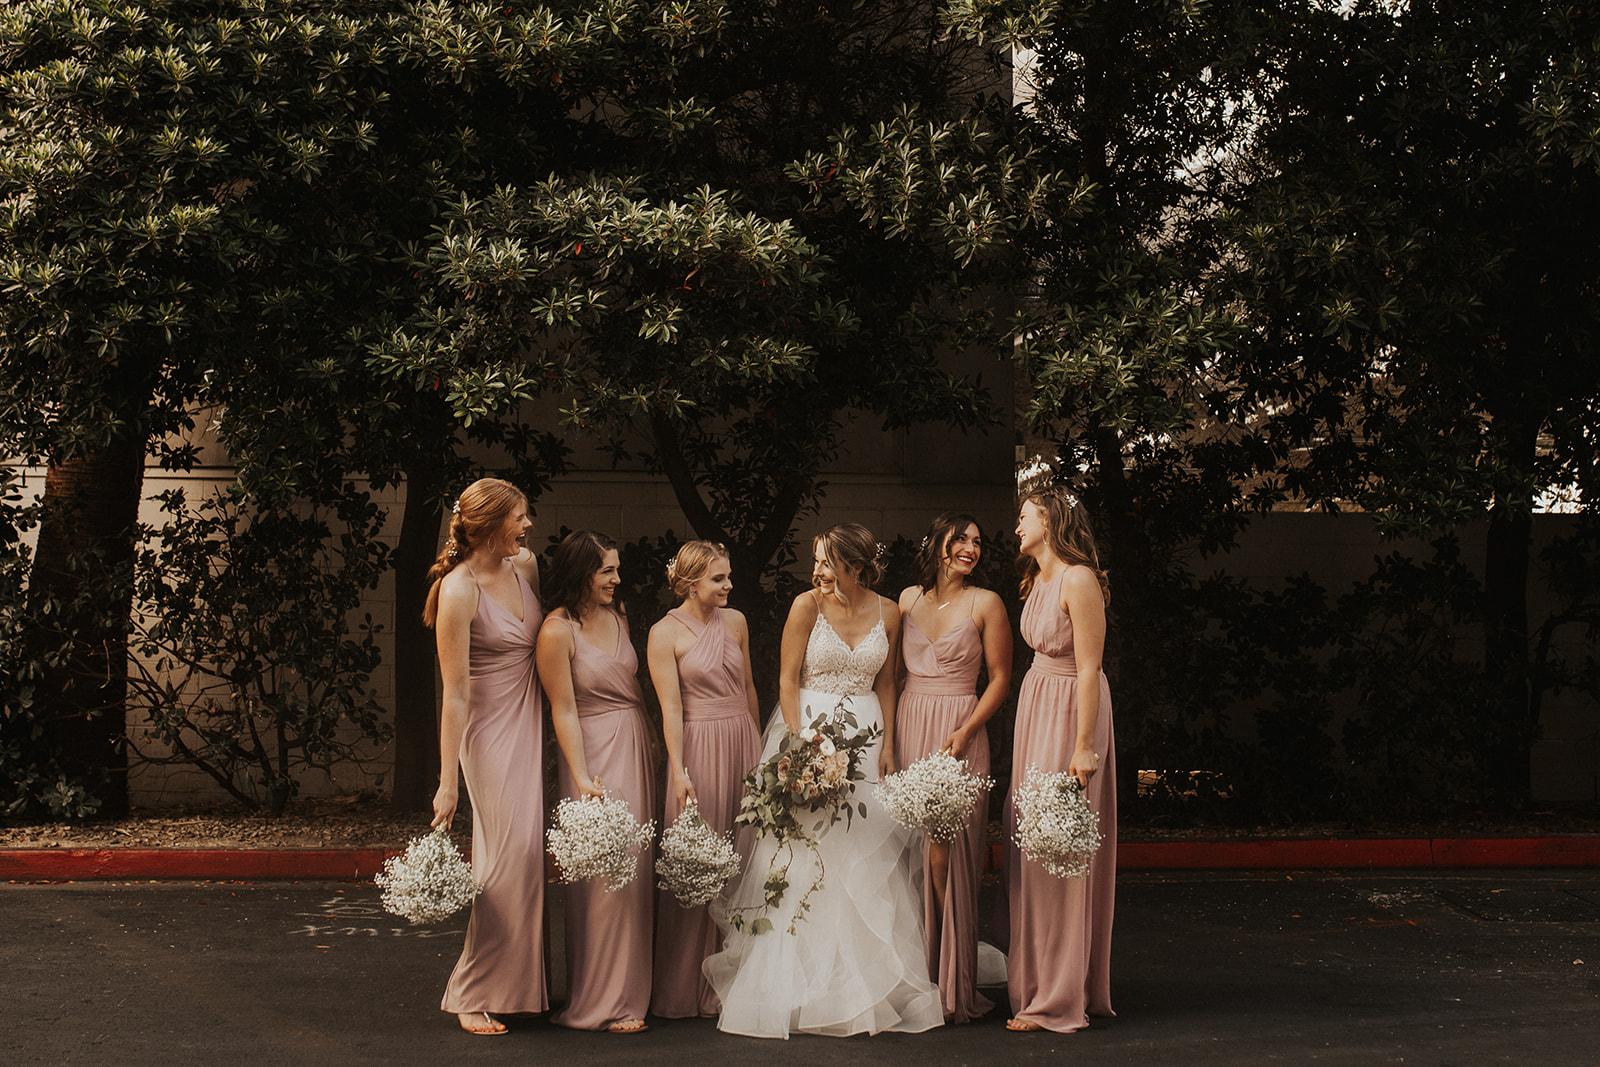 bridal party spokane bride vegas wedding